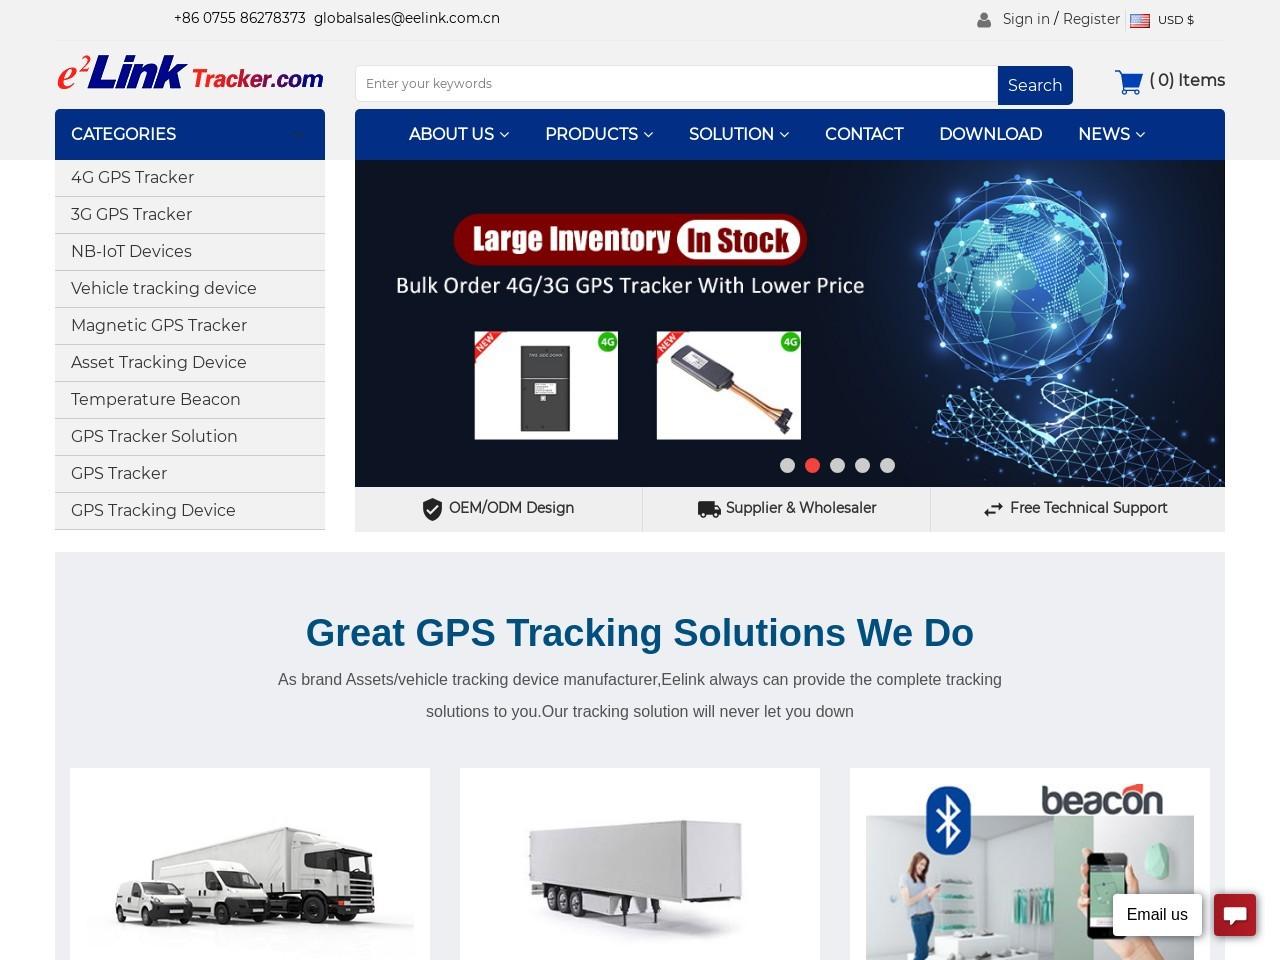 gps asset tracker-Eelink Communication Technology Limited